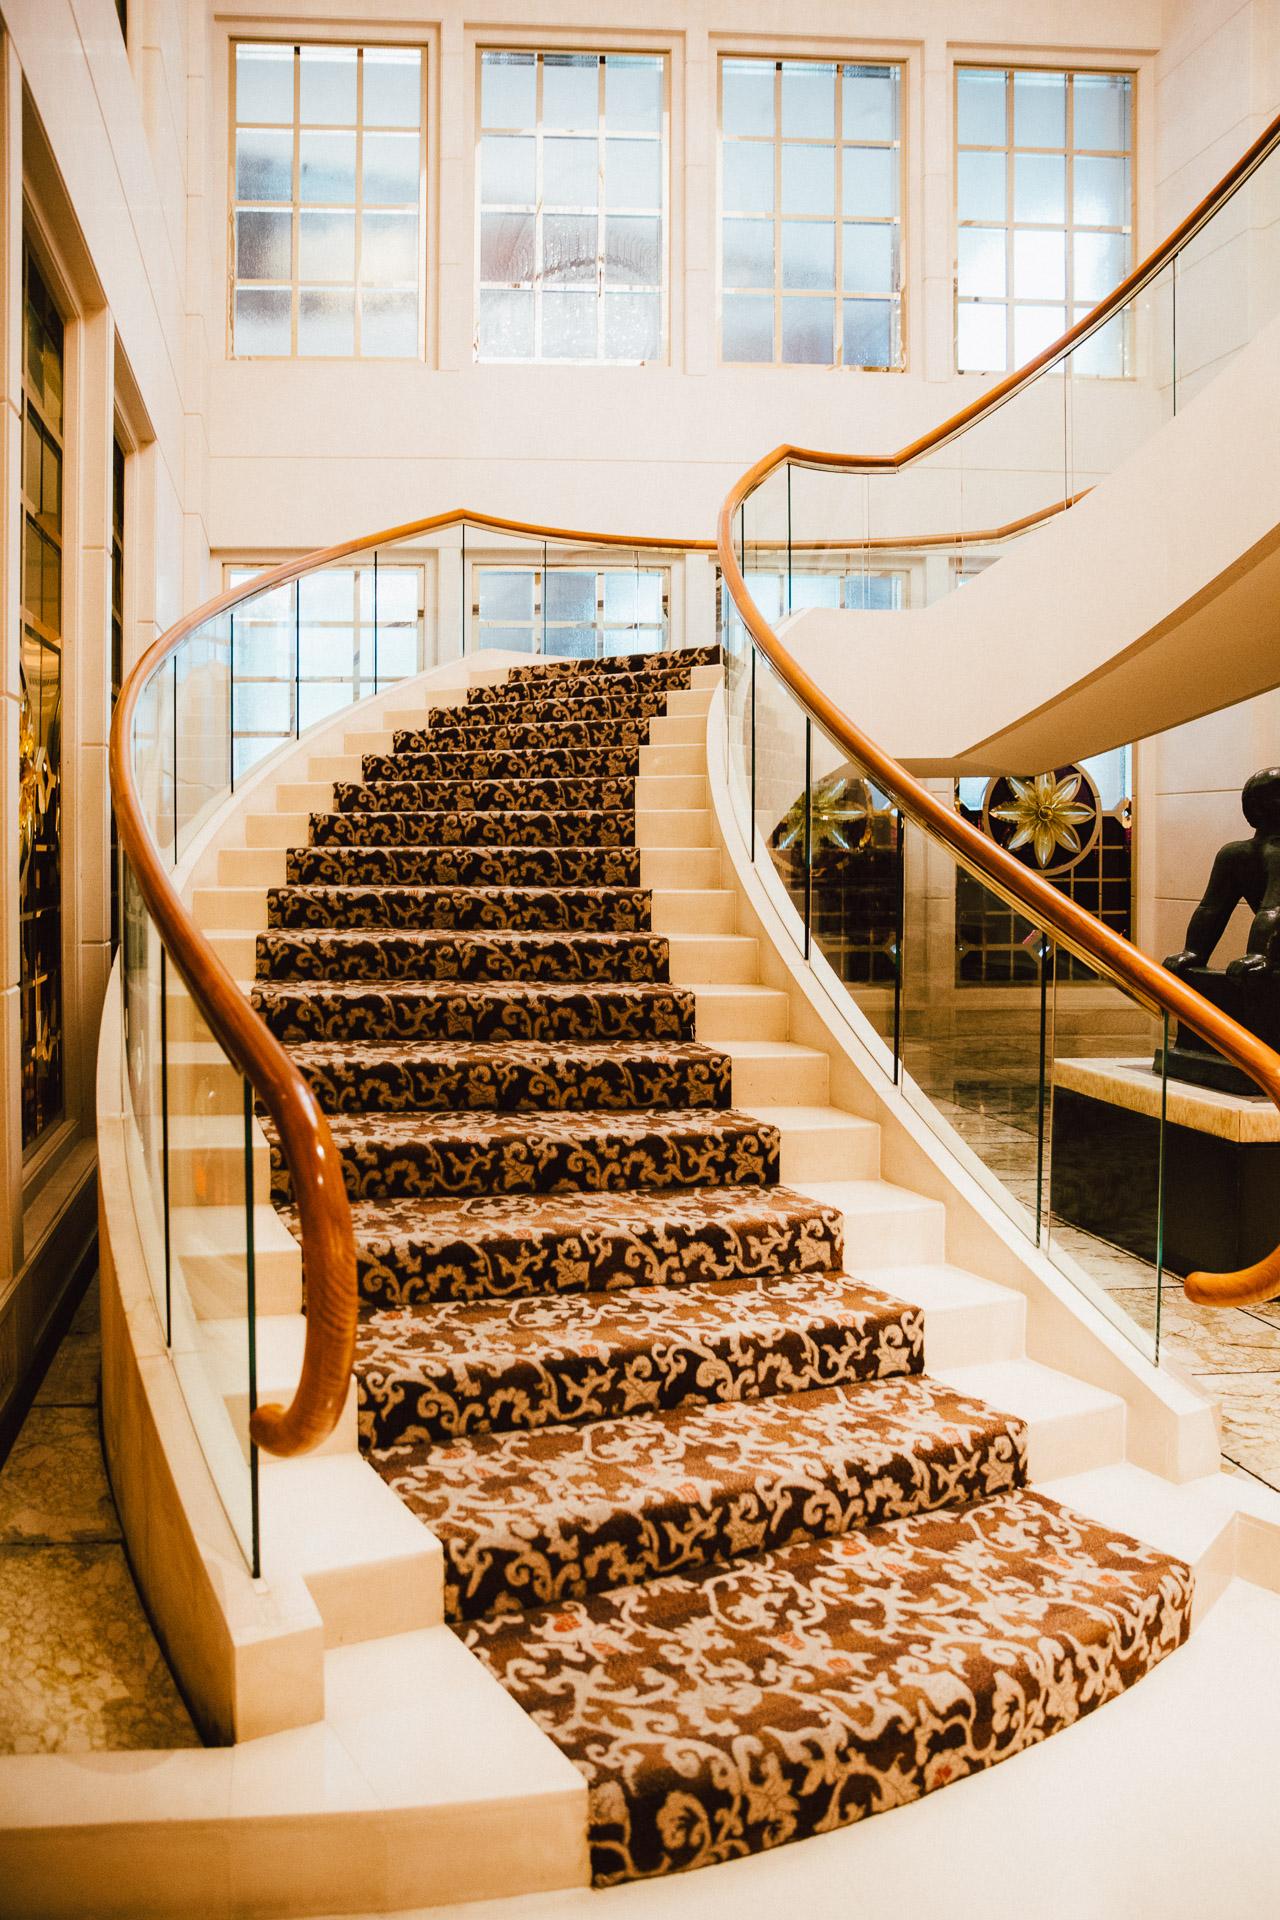 st-regis-singapore-marriott-luxury-hotel-photographer-23.jpg